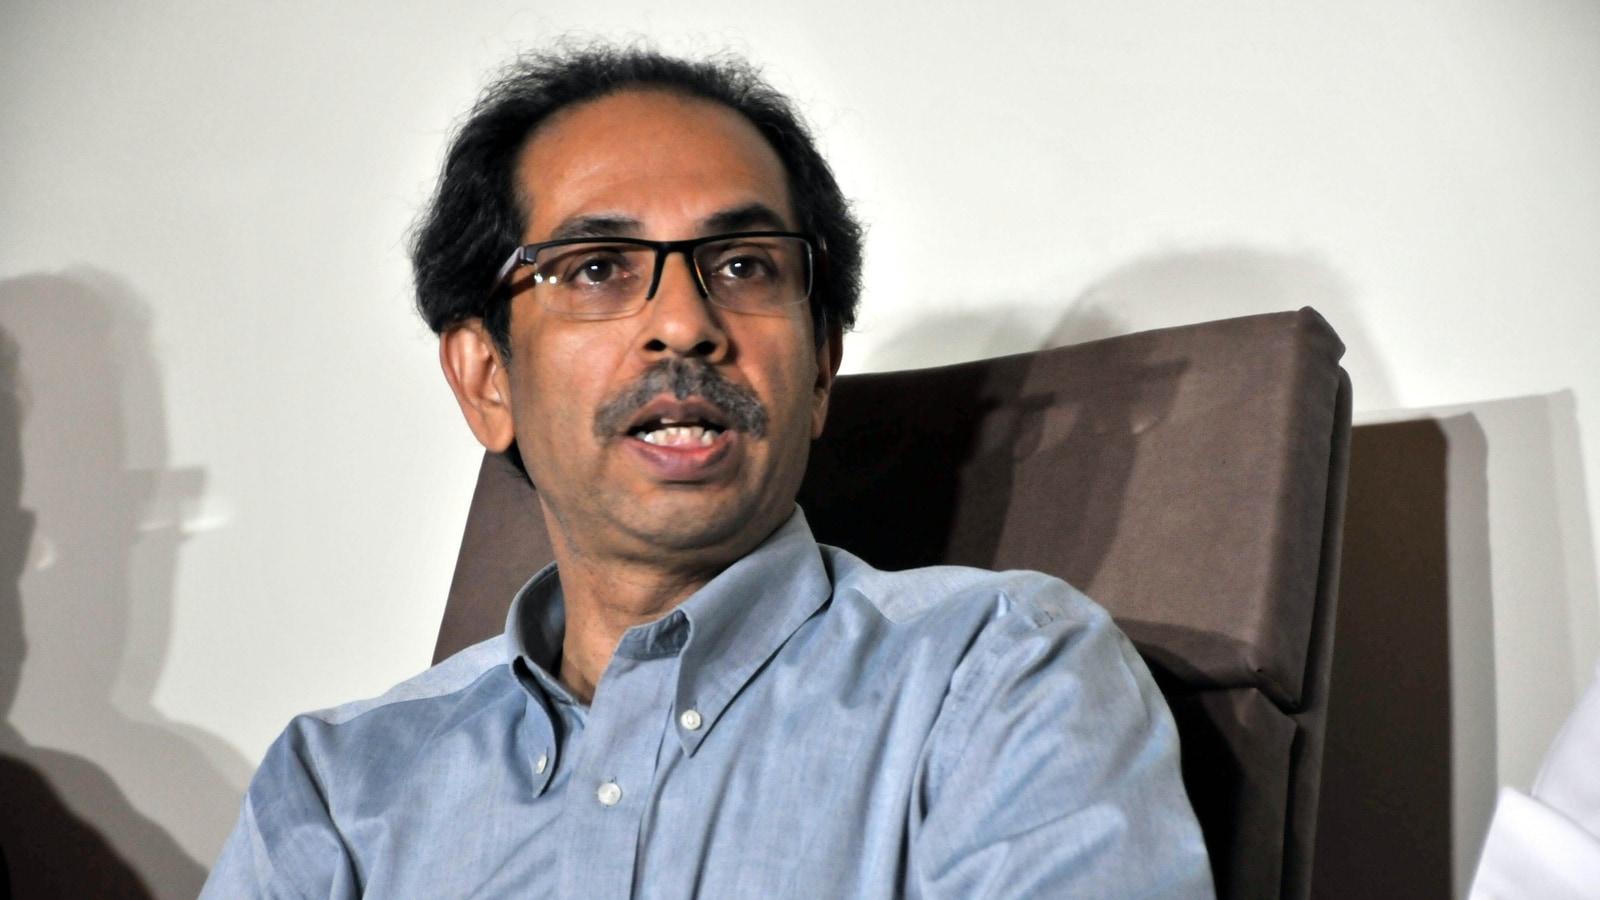 Hindutva faces threat from 'neo-Hindus', says Uddhav